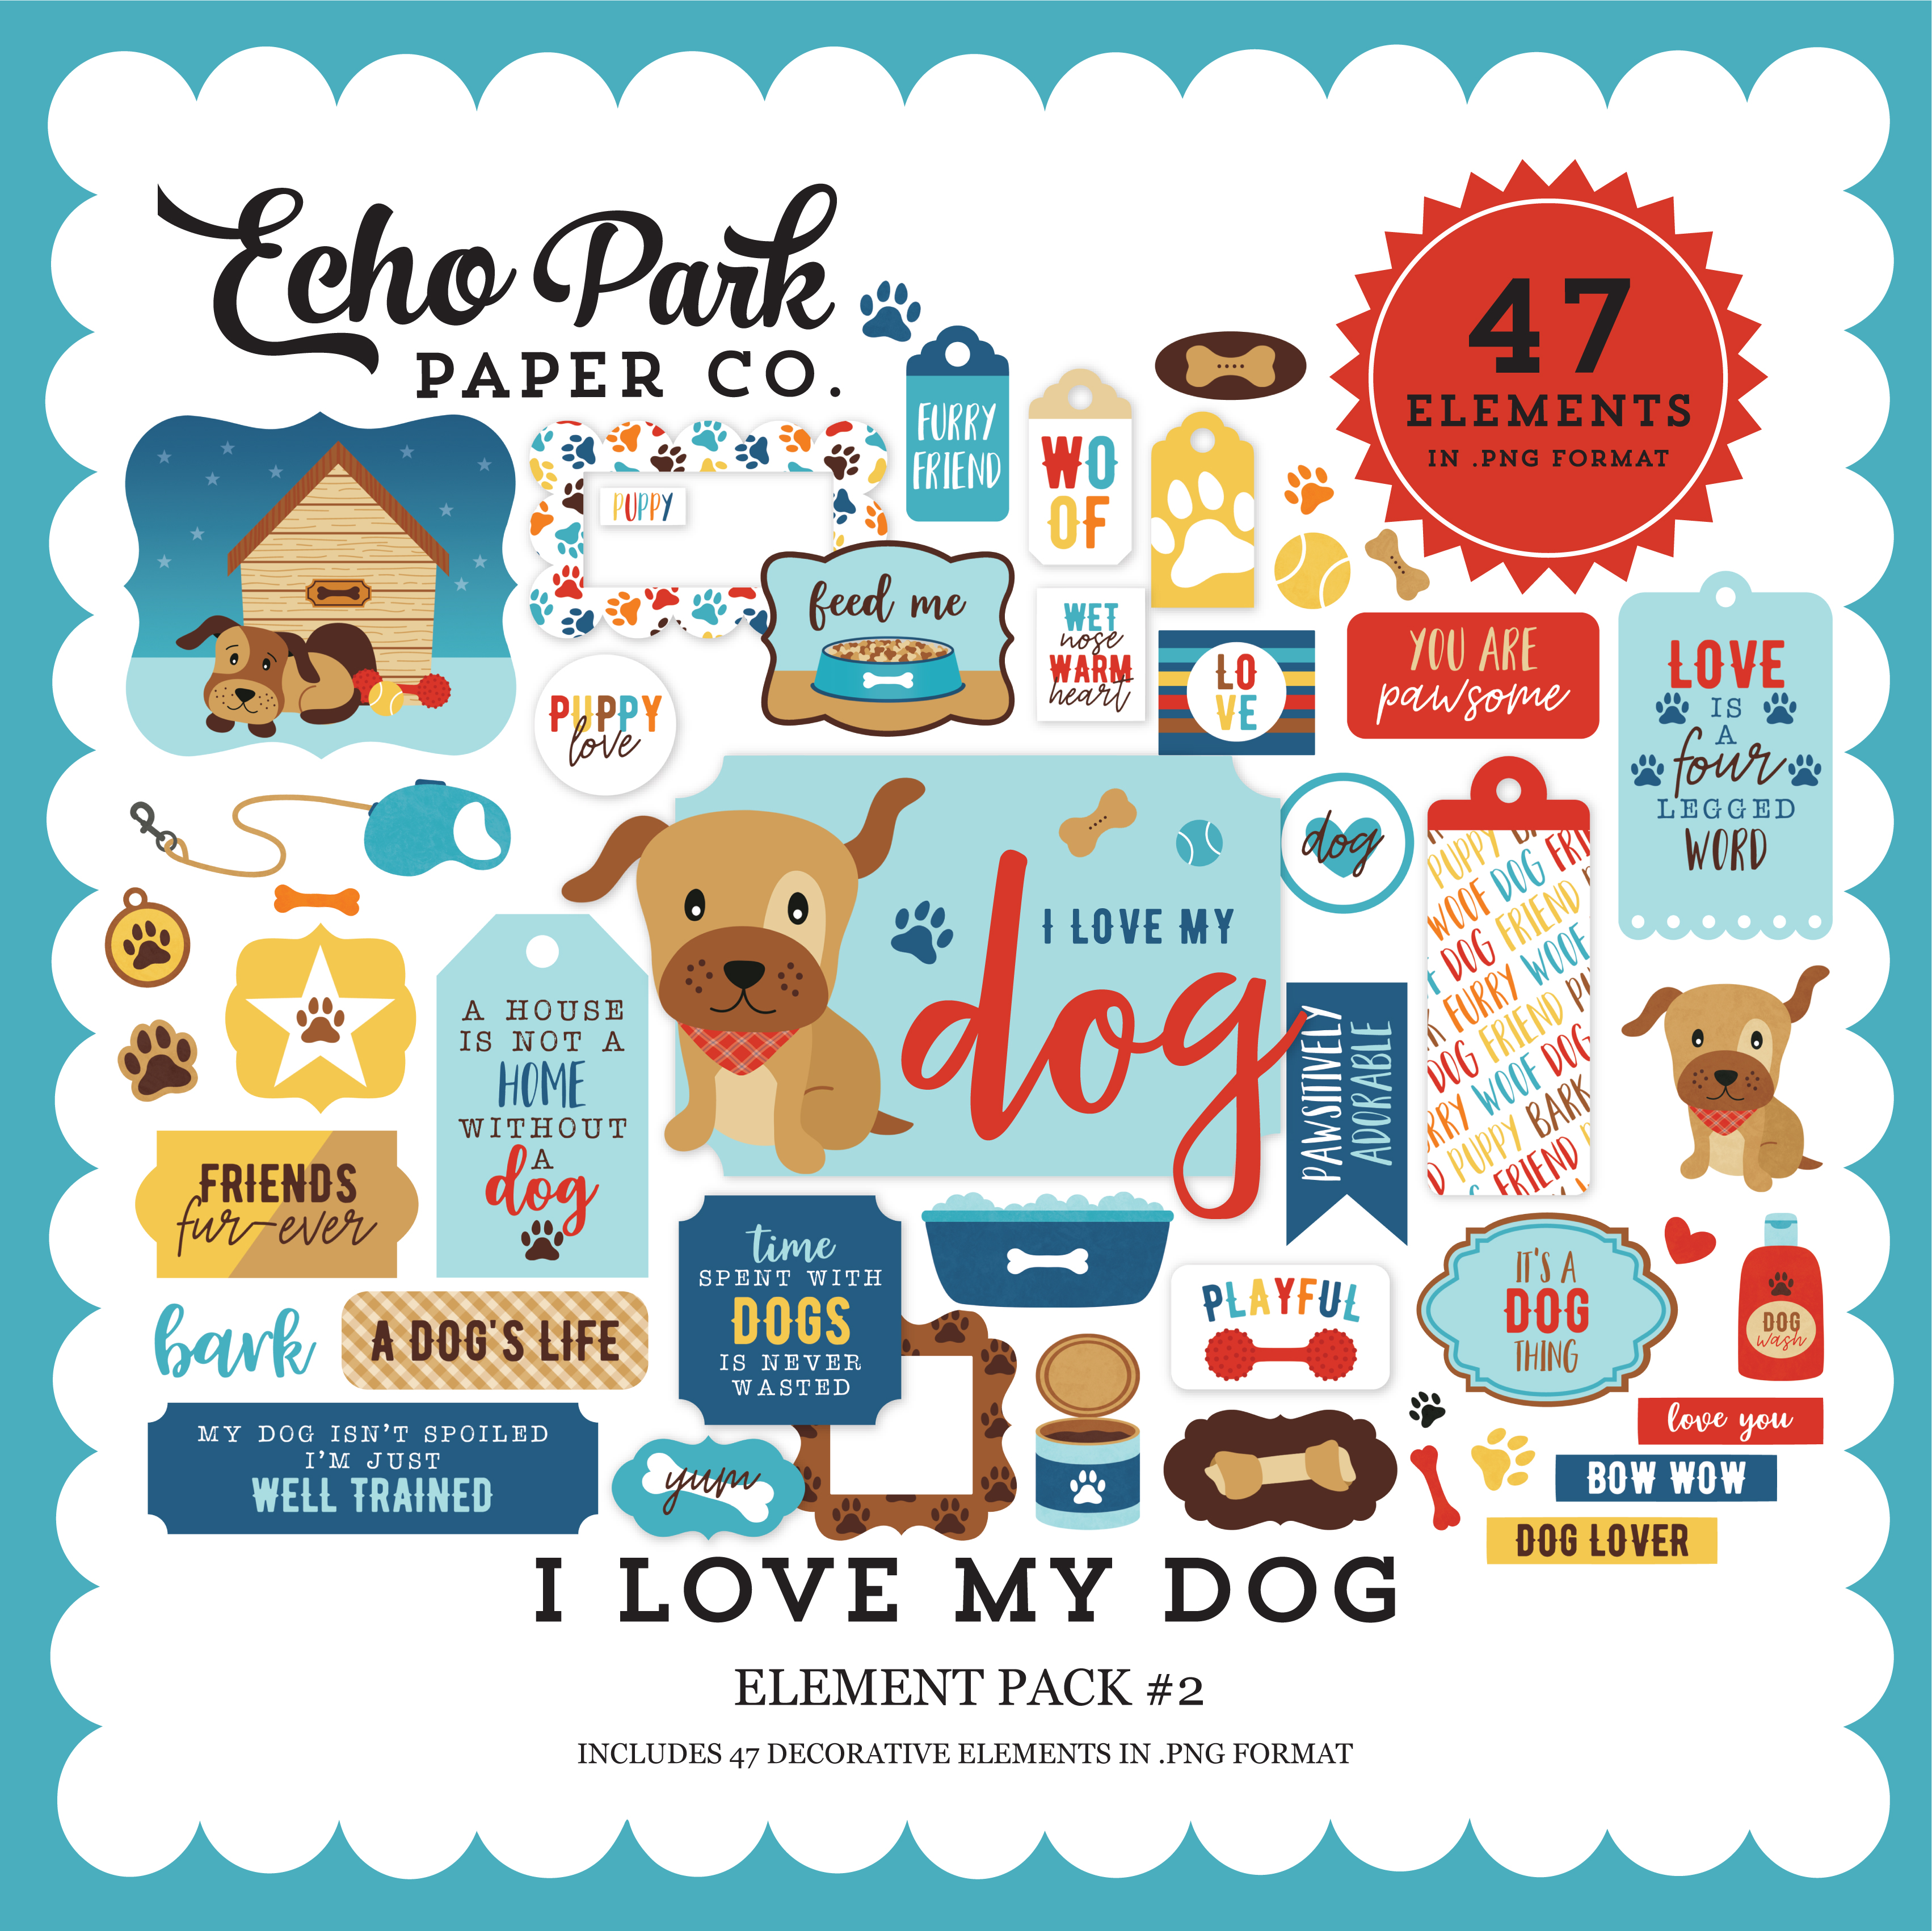 I Love My Dog Element Pack #2